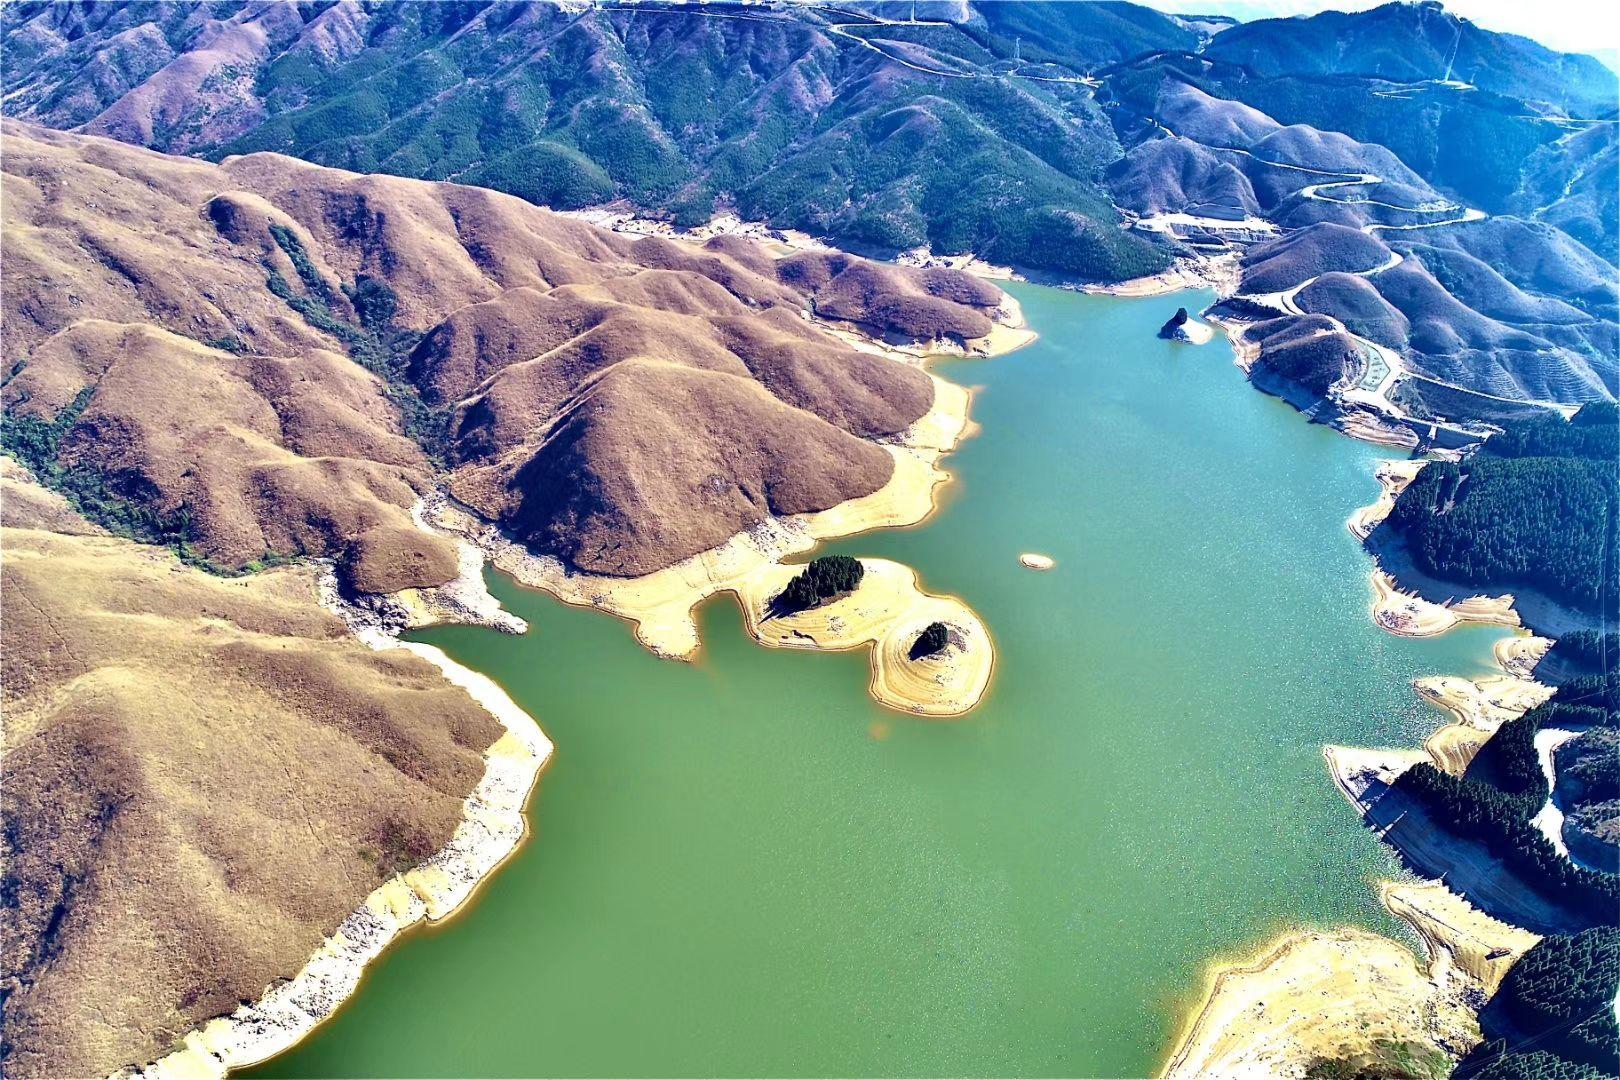 Tian Lake Reservoir